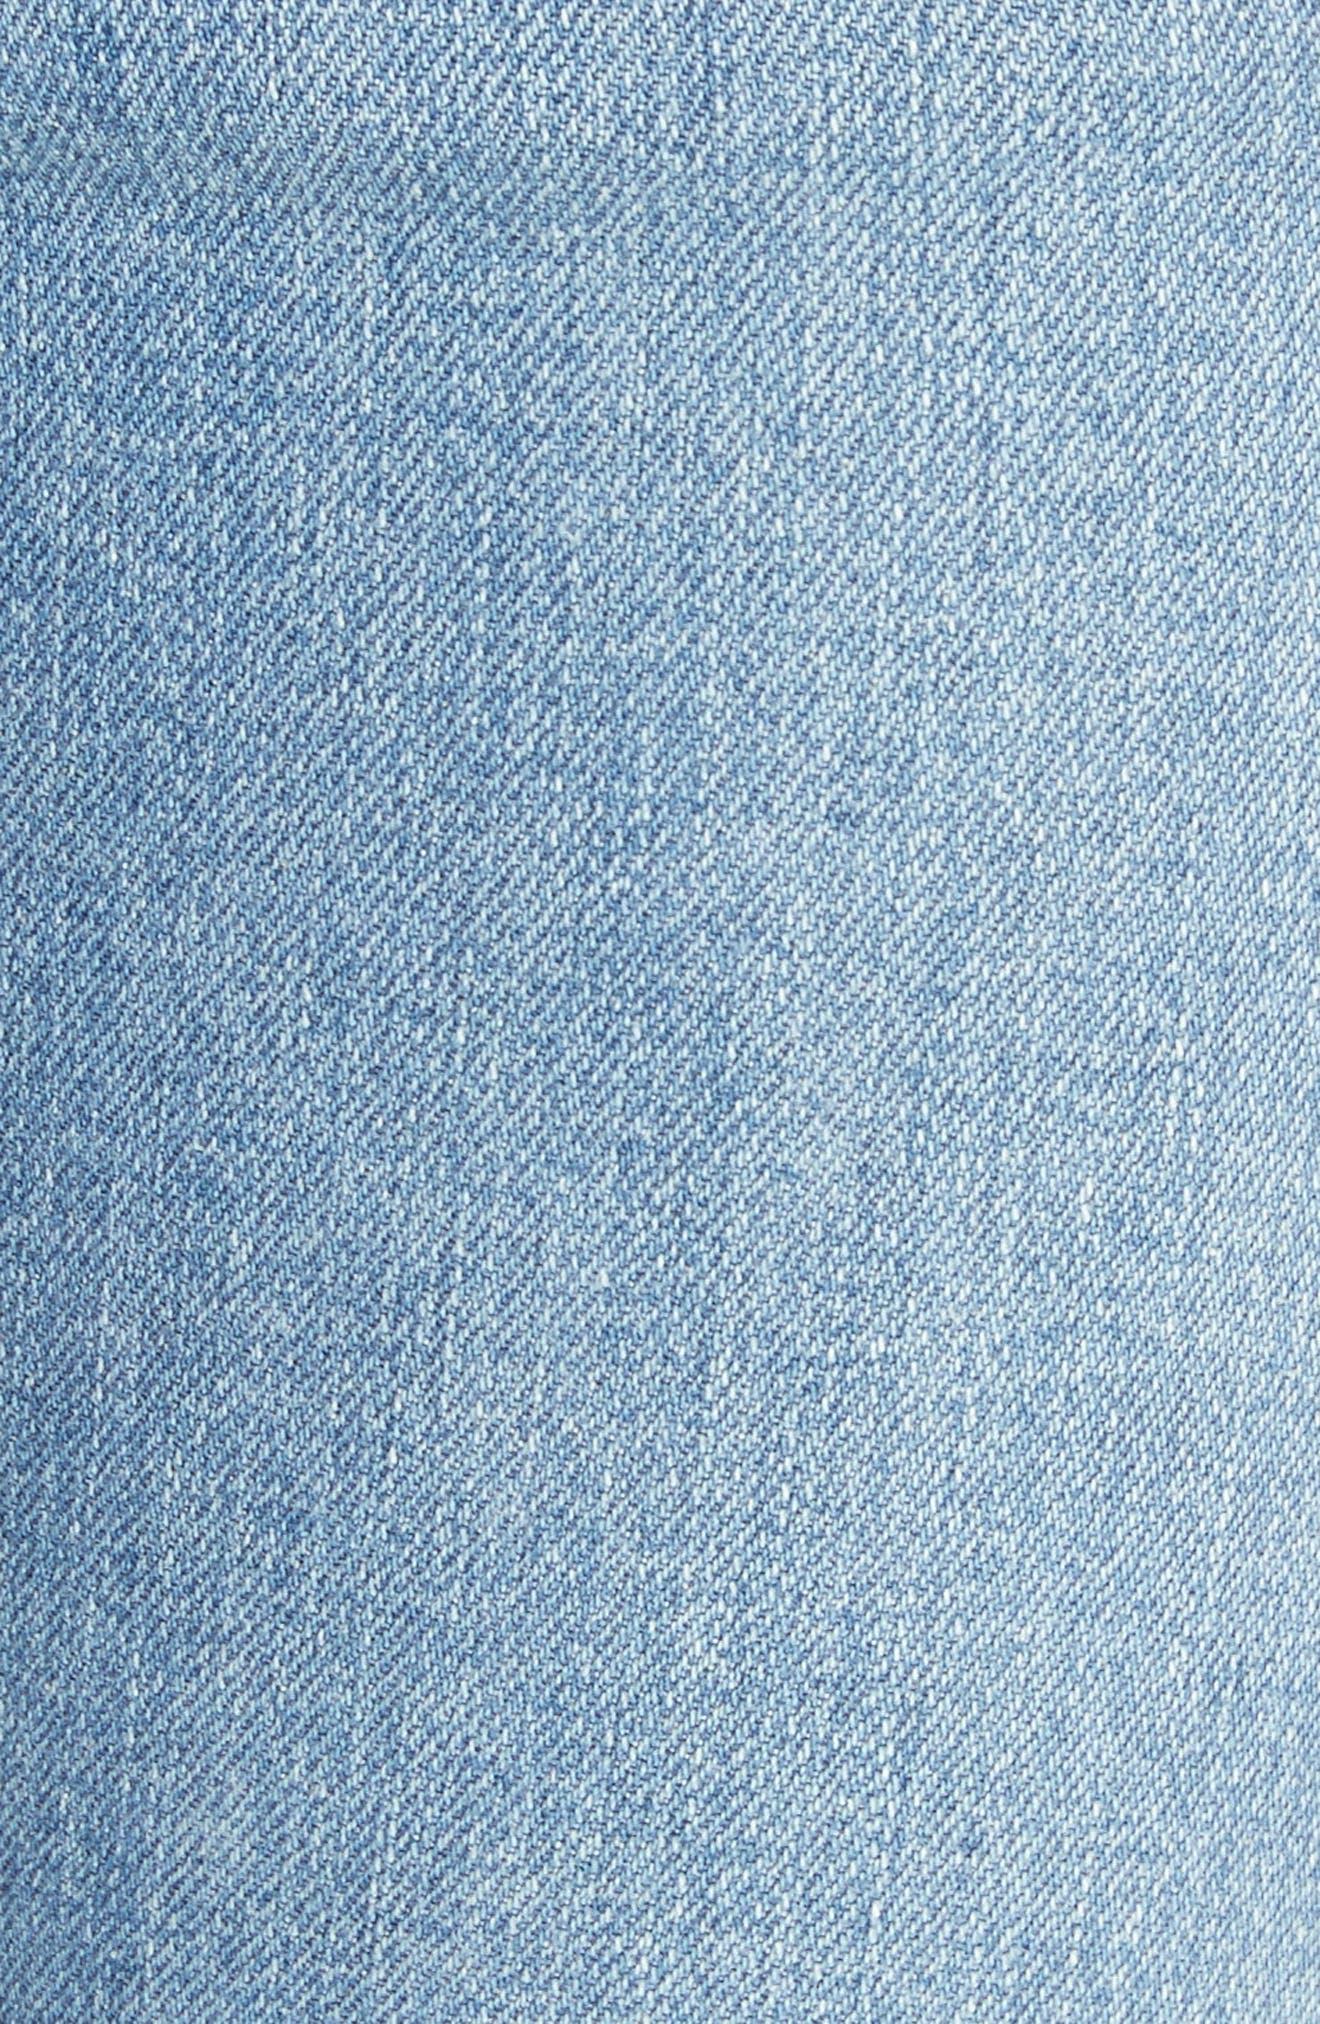 Lowry Split Hem Jeans,                             Alternate thumbnail 6, color,                             Mid Indigo Wash